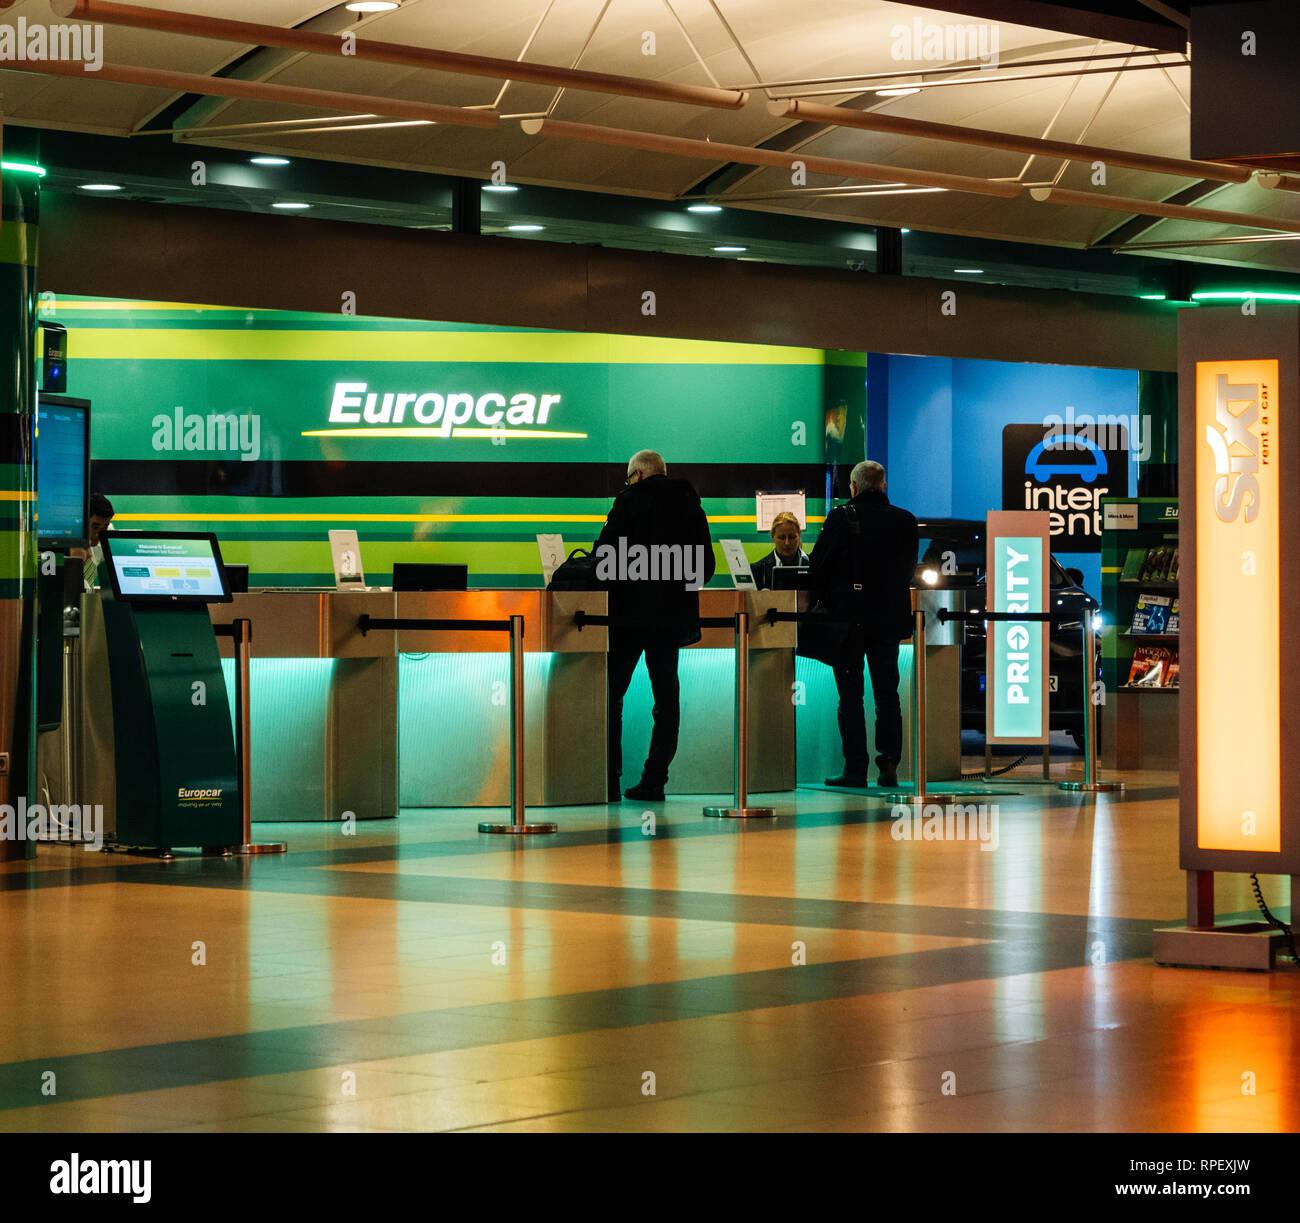 airport car rental desk stock photos airport car rental. Black Bedroom Furniture Sets. Home Design Ideas